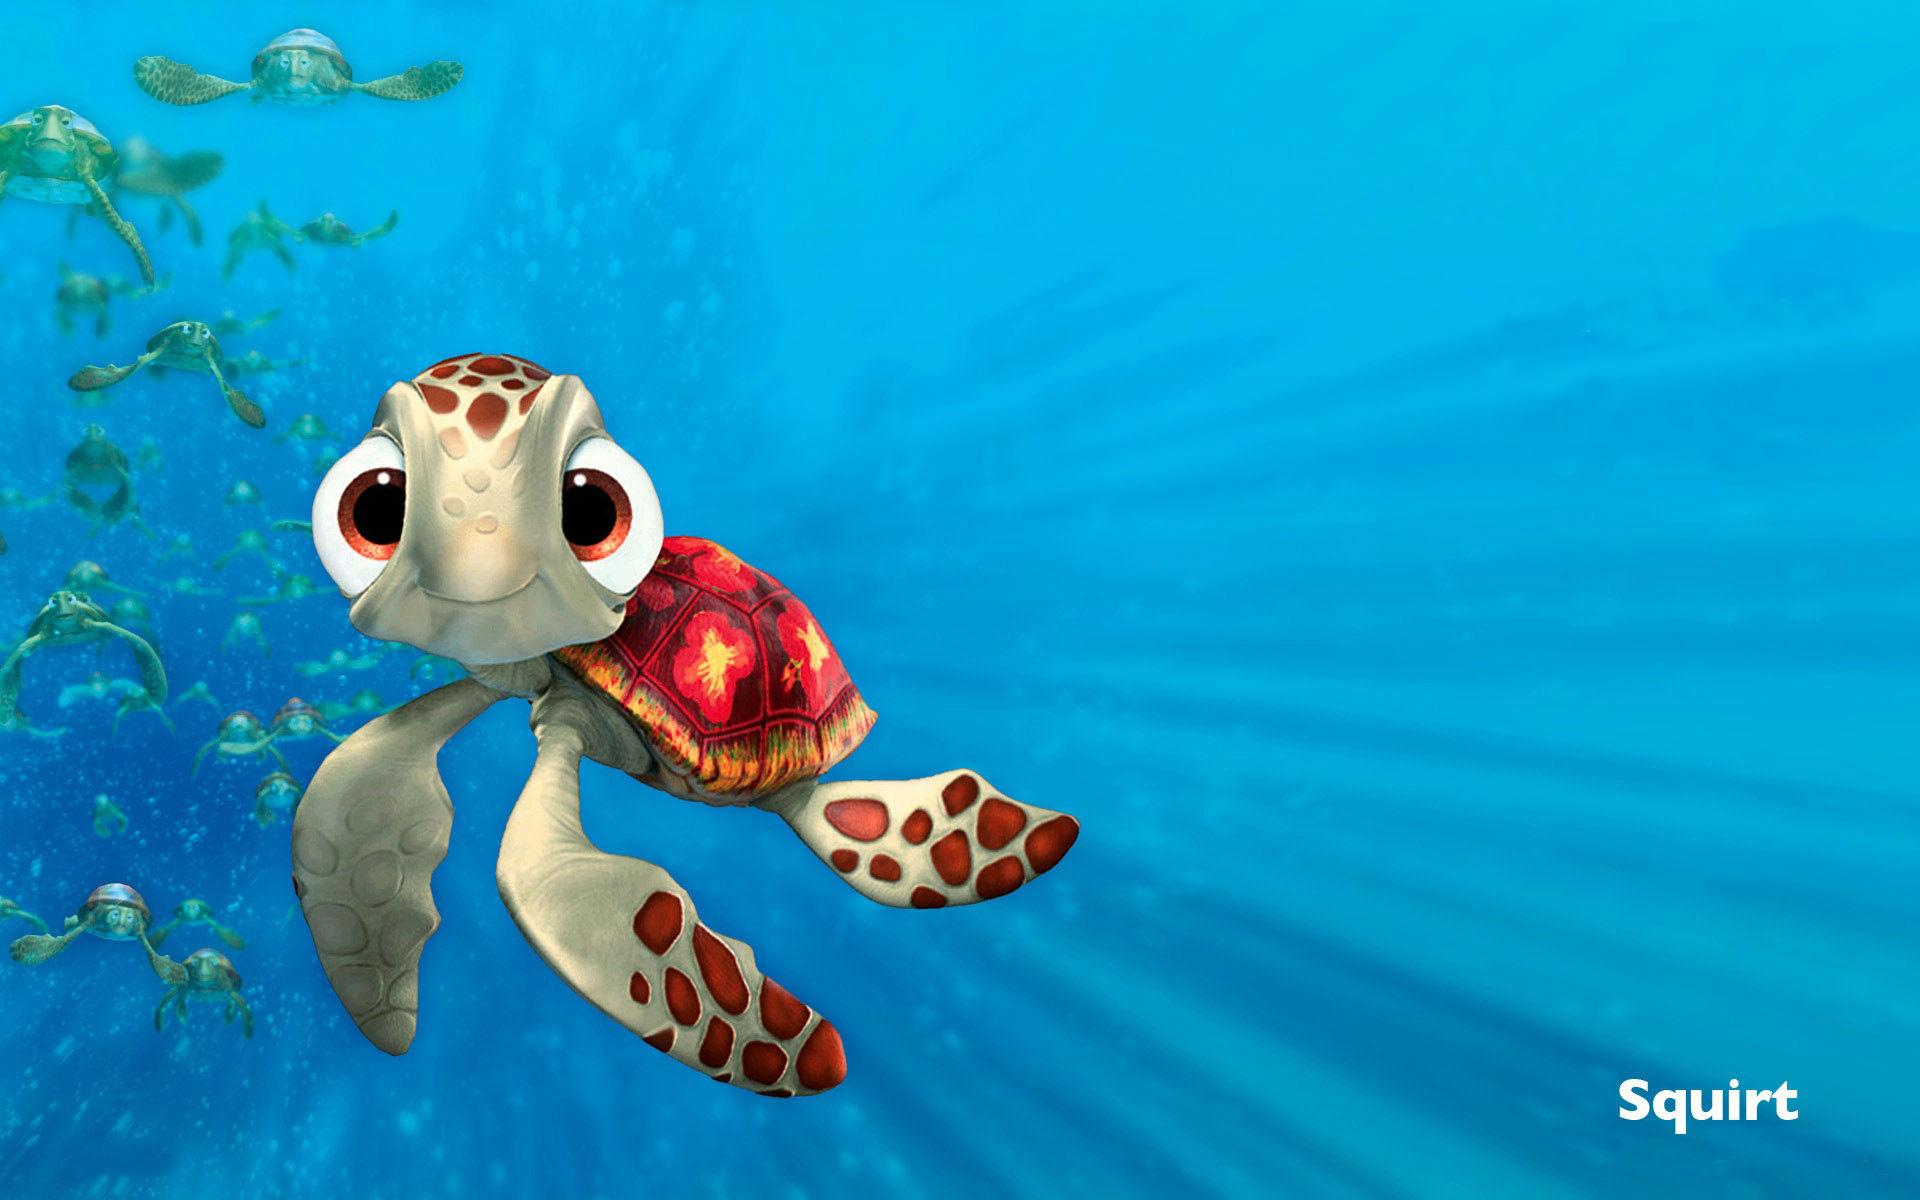 Finding Nemo Squirt 1920x1200 Wallpaper Teahub Io